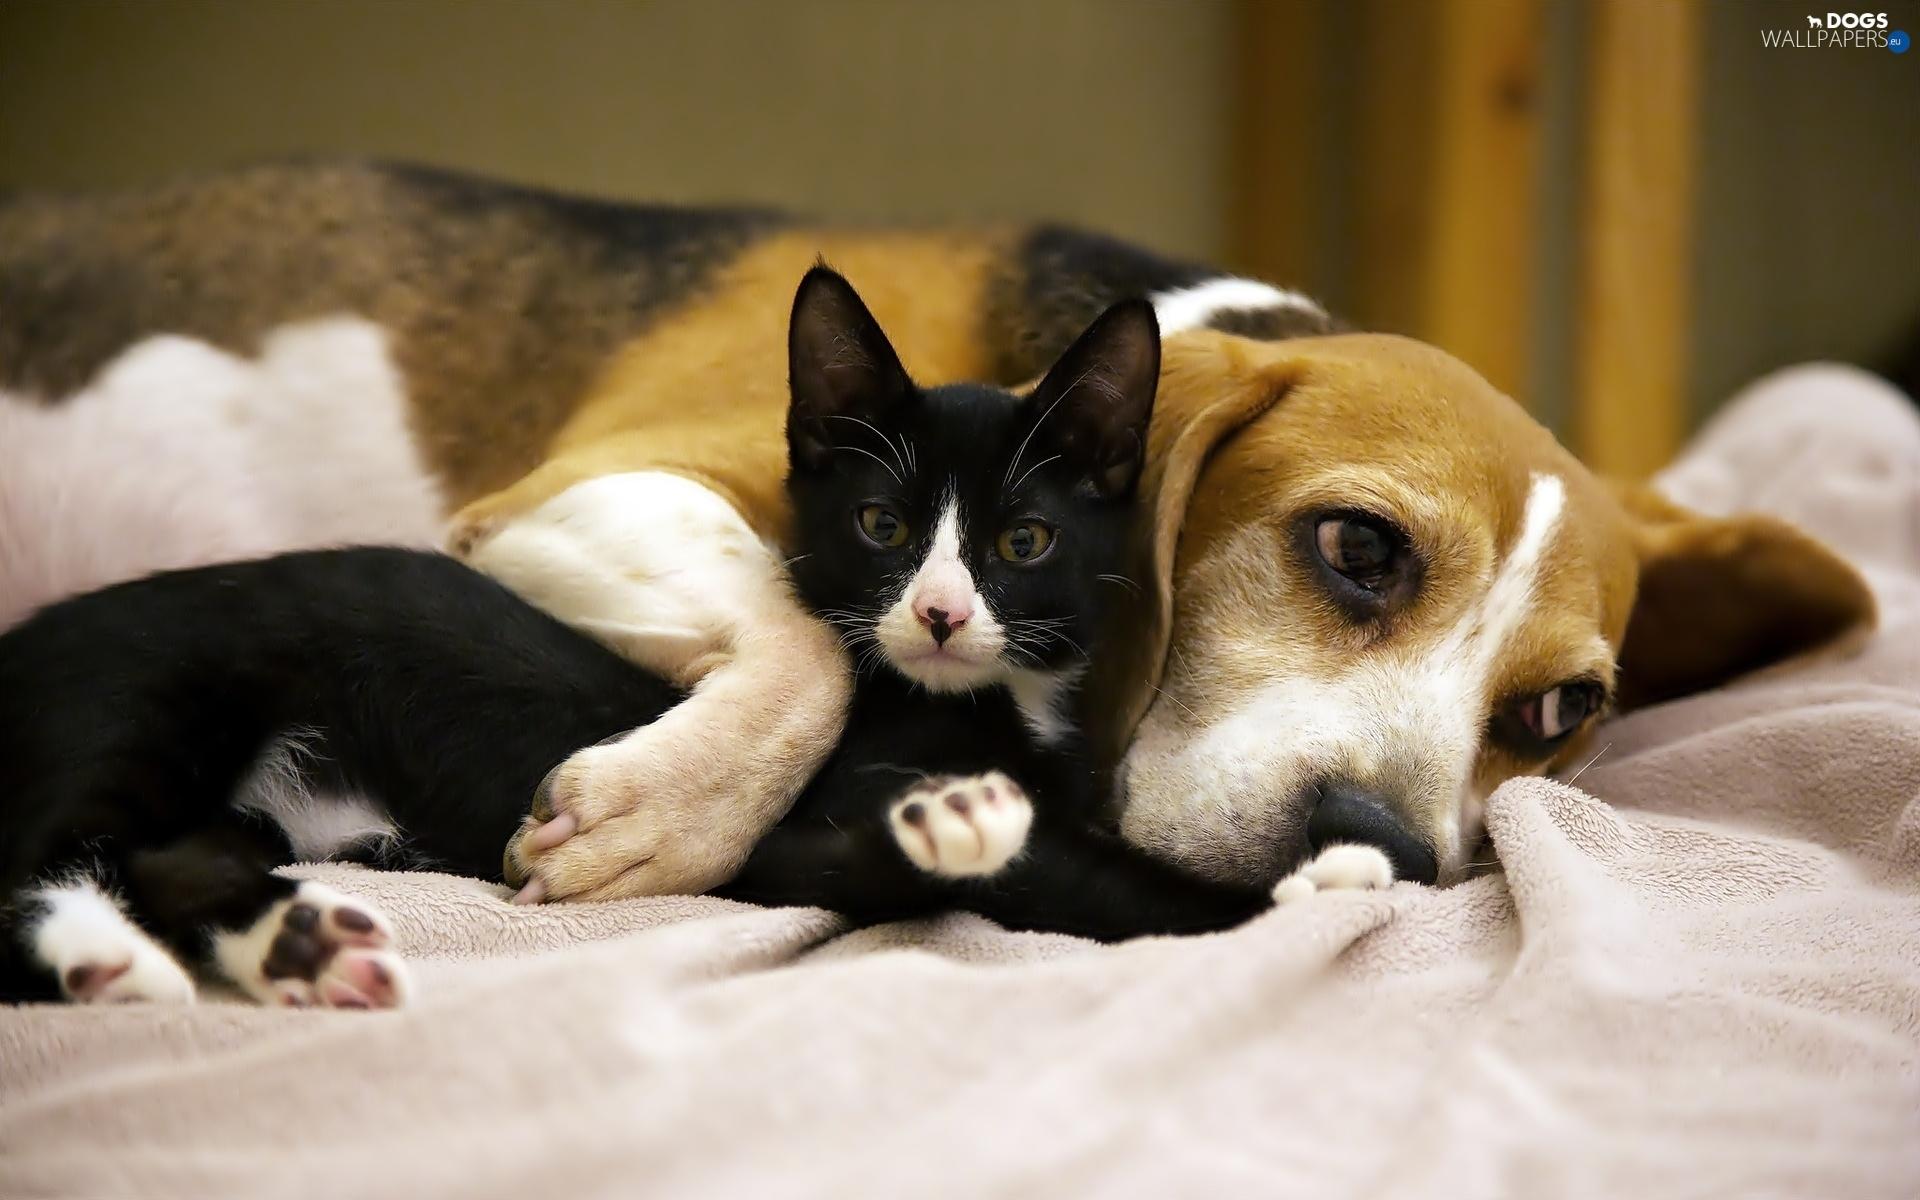 friends, dog, Black, Beagle, kitten - Dogs wallpapers: 1920x1200